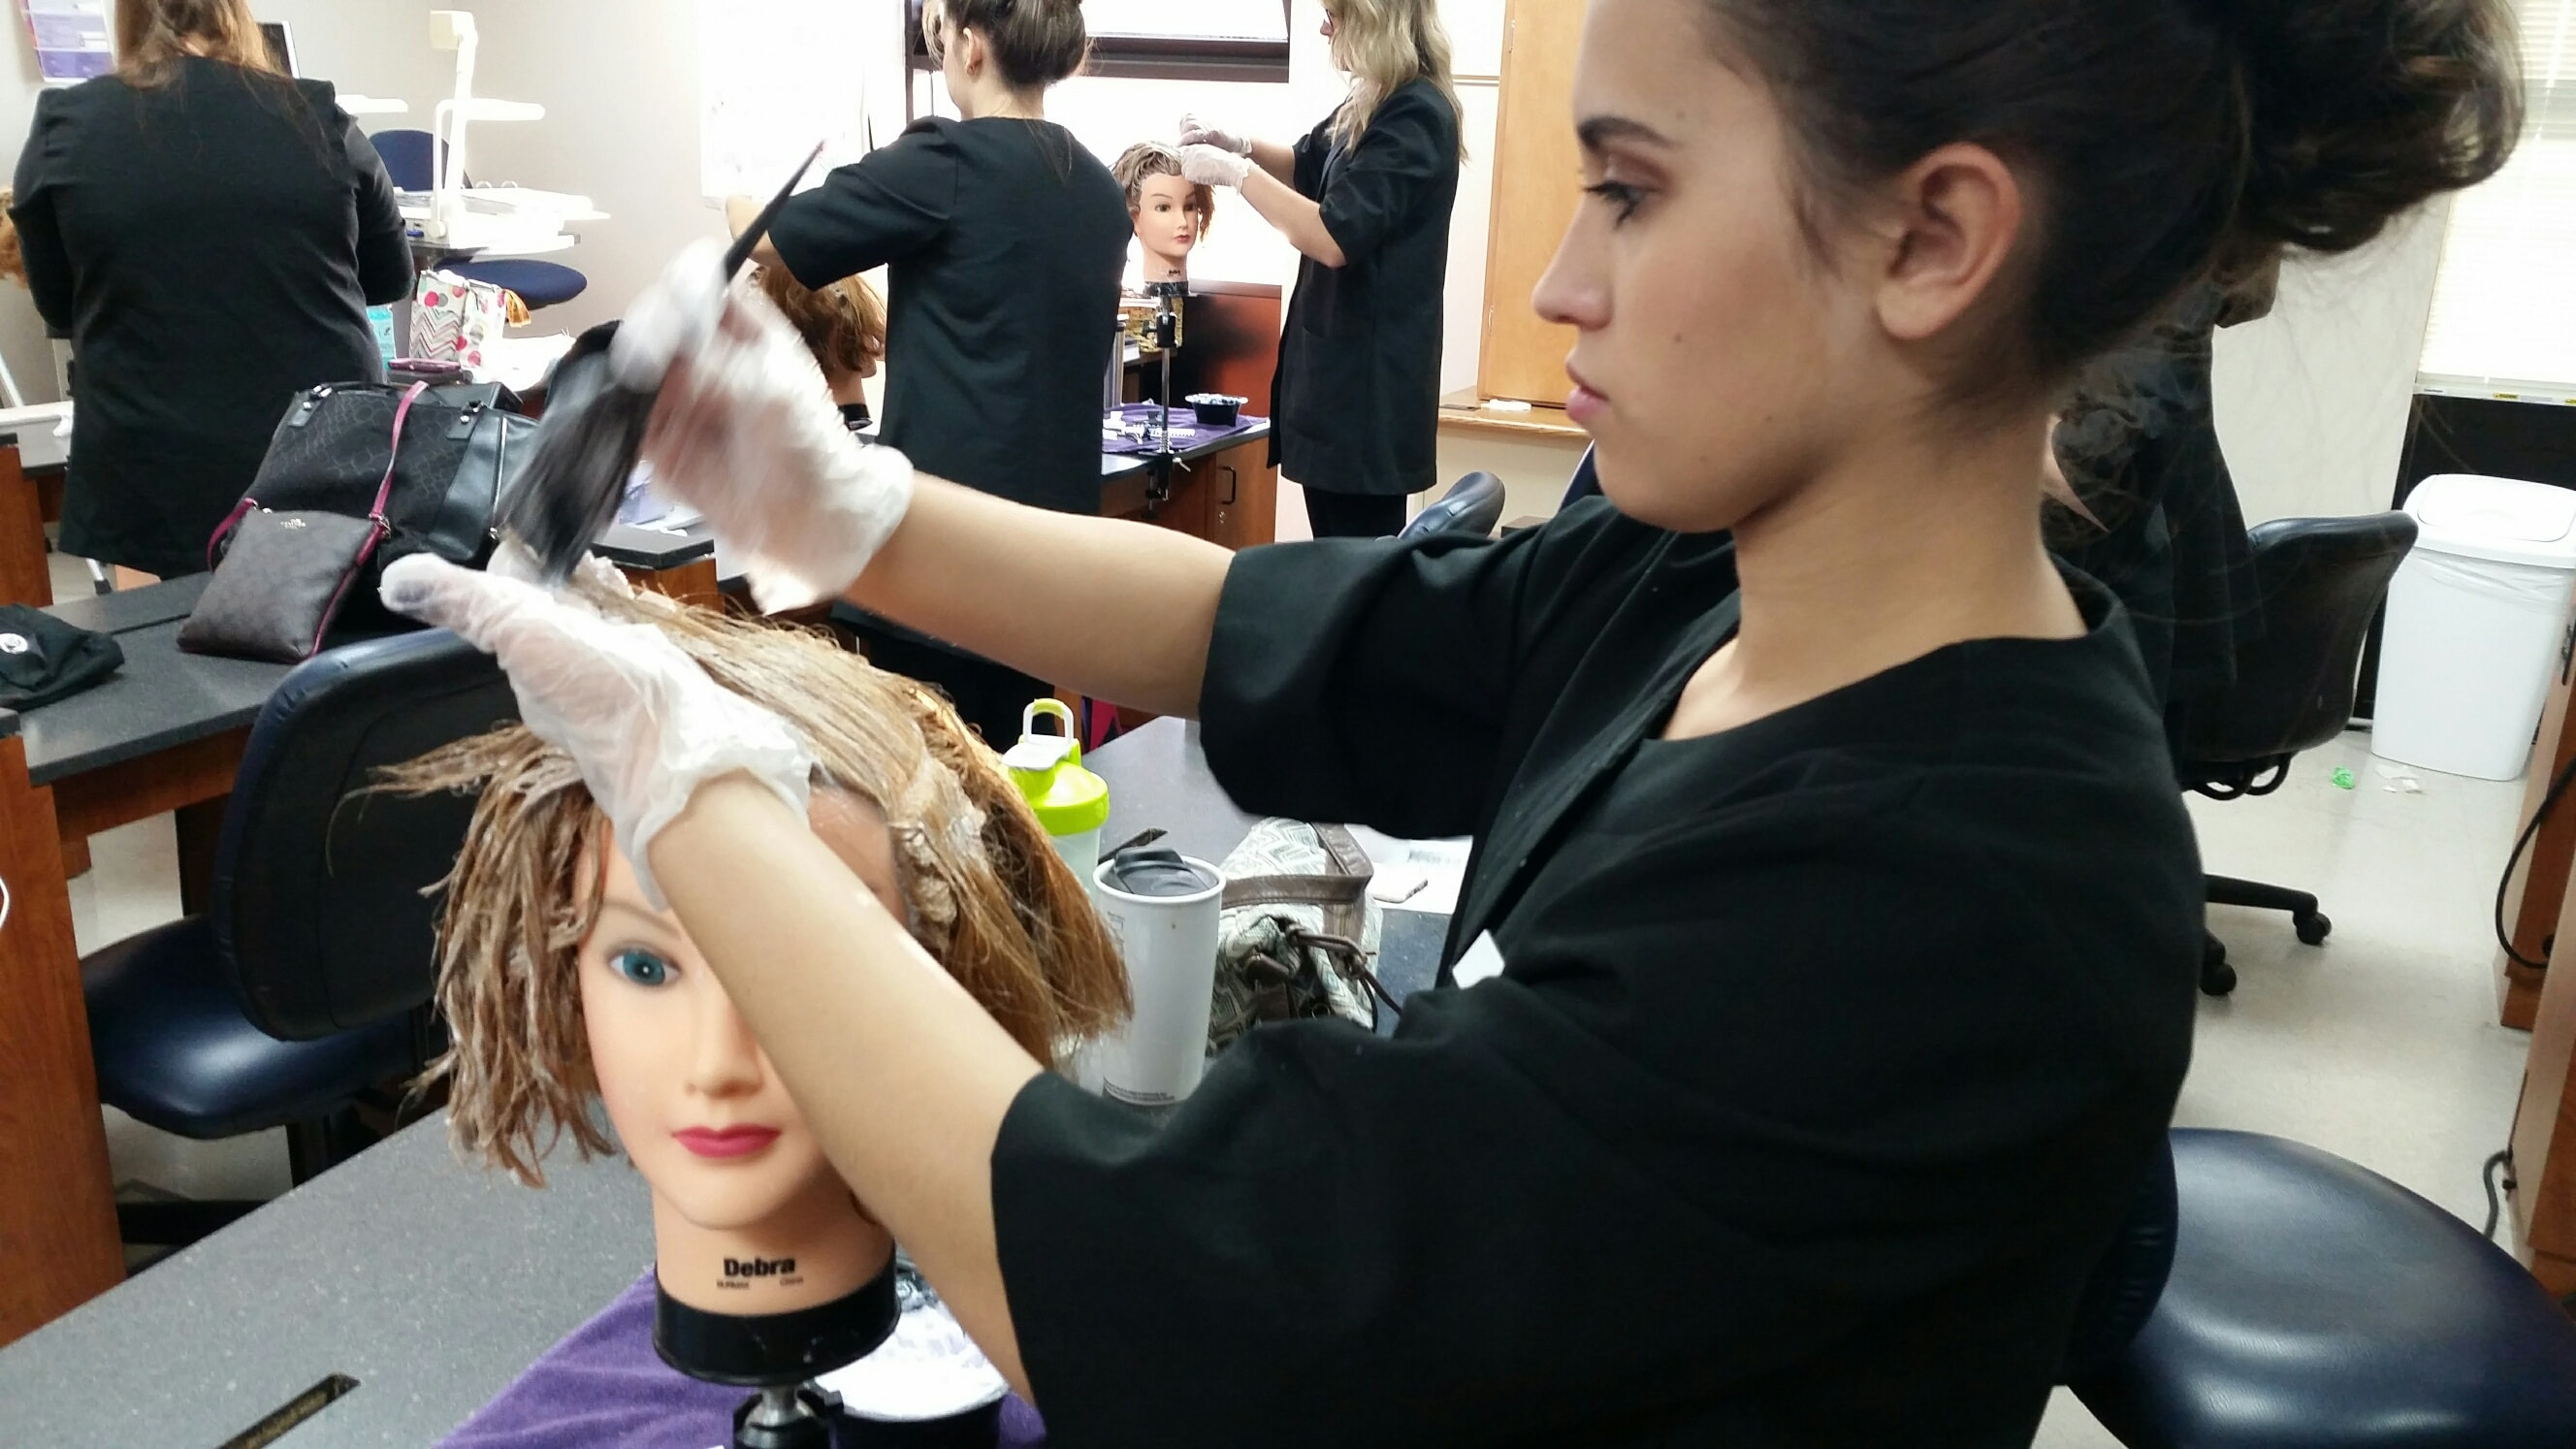 MPTC Cosmo student applying bleach on manikin